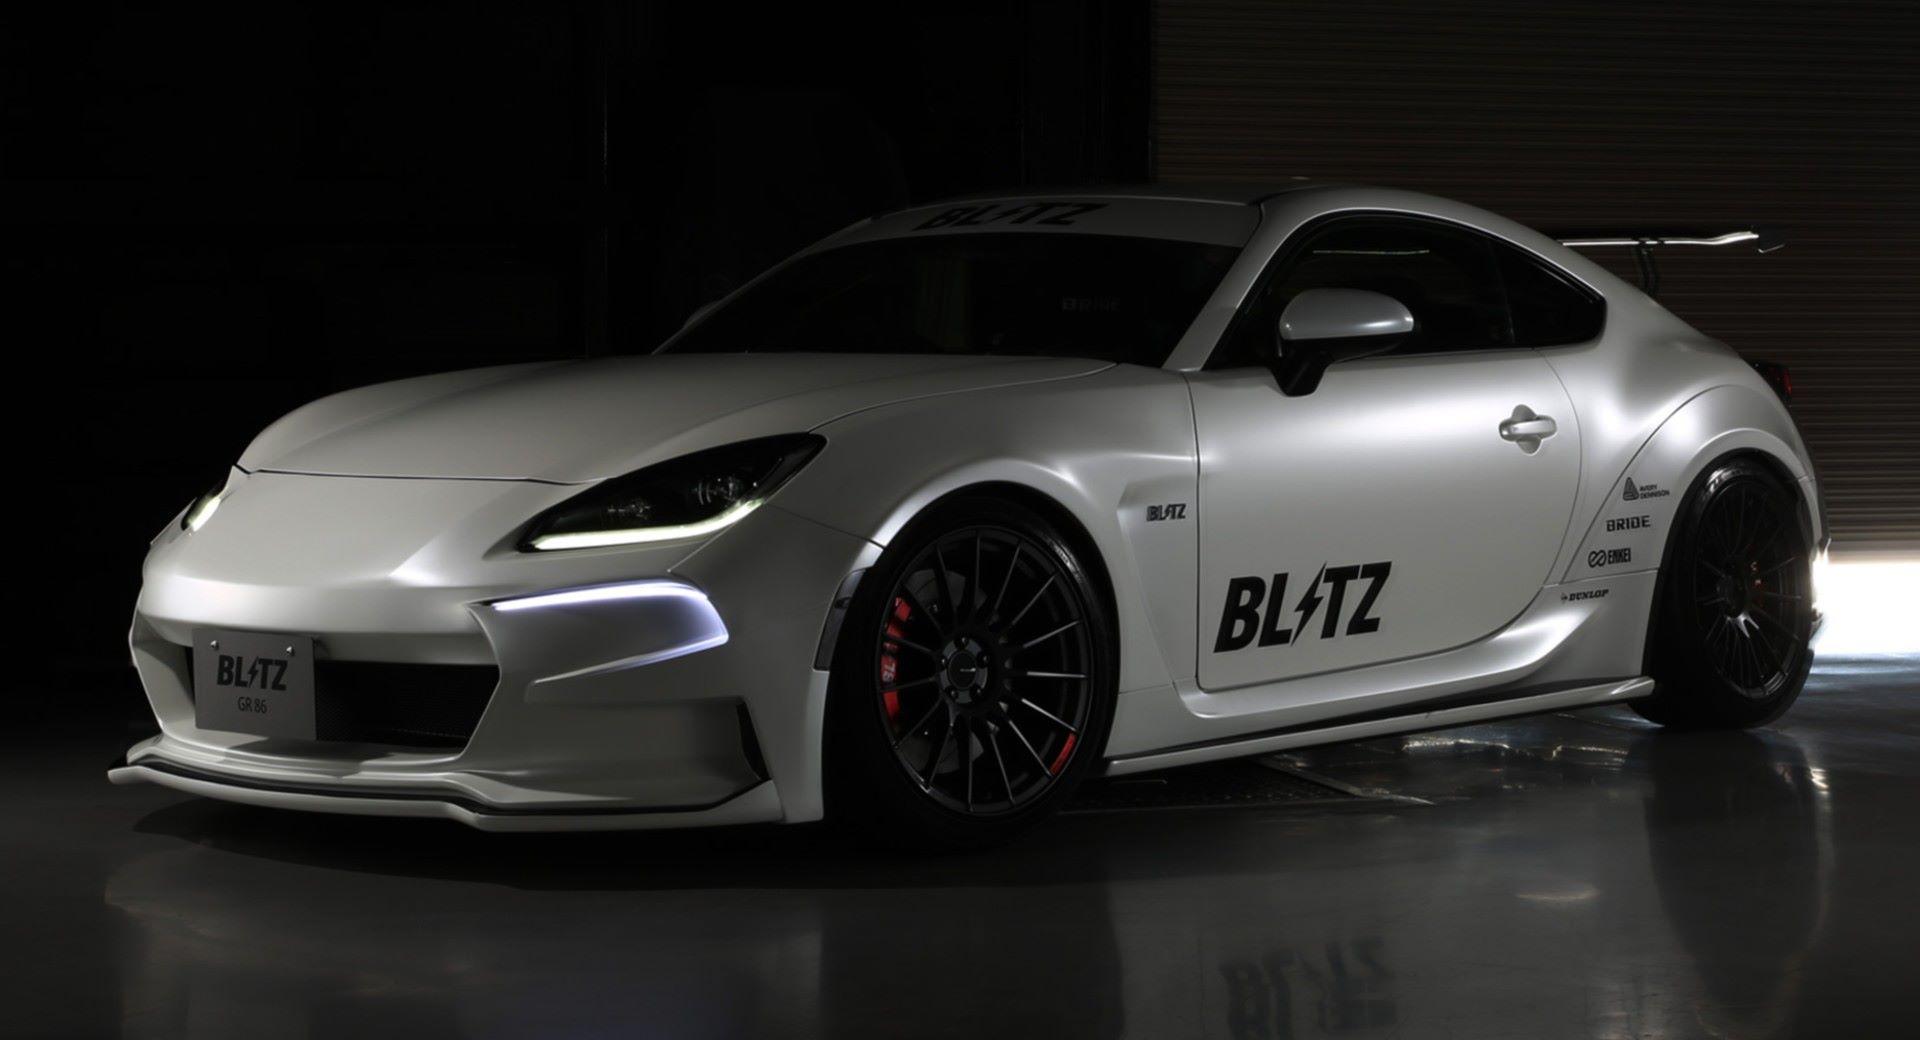 Toyota-GR-86-by-Blitz-9